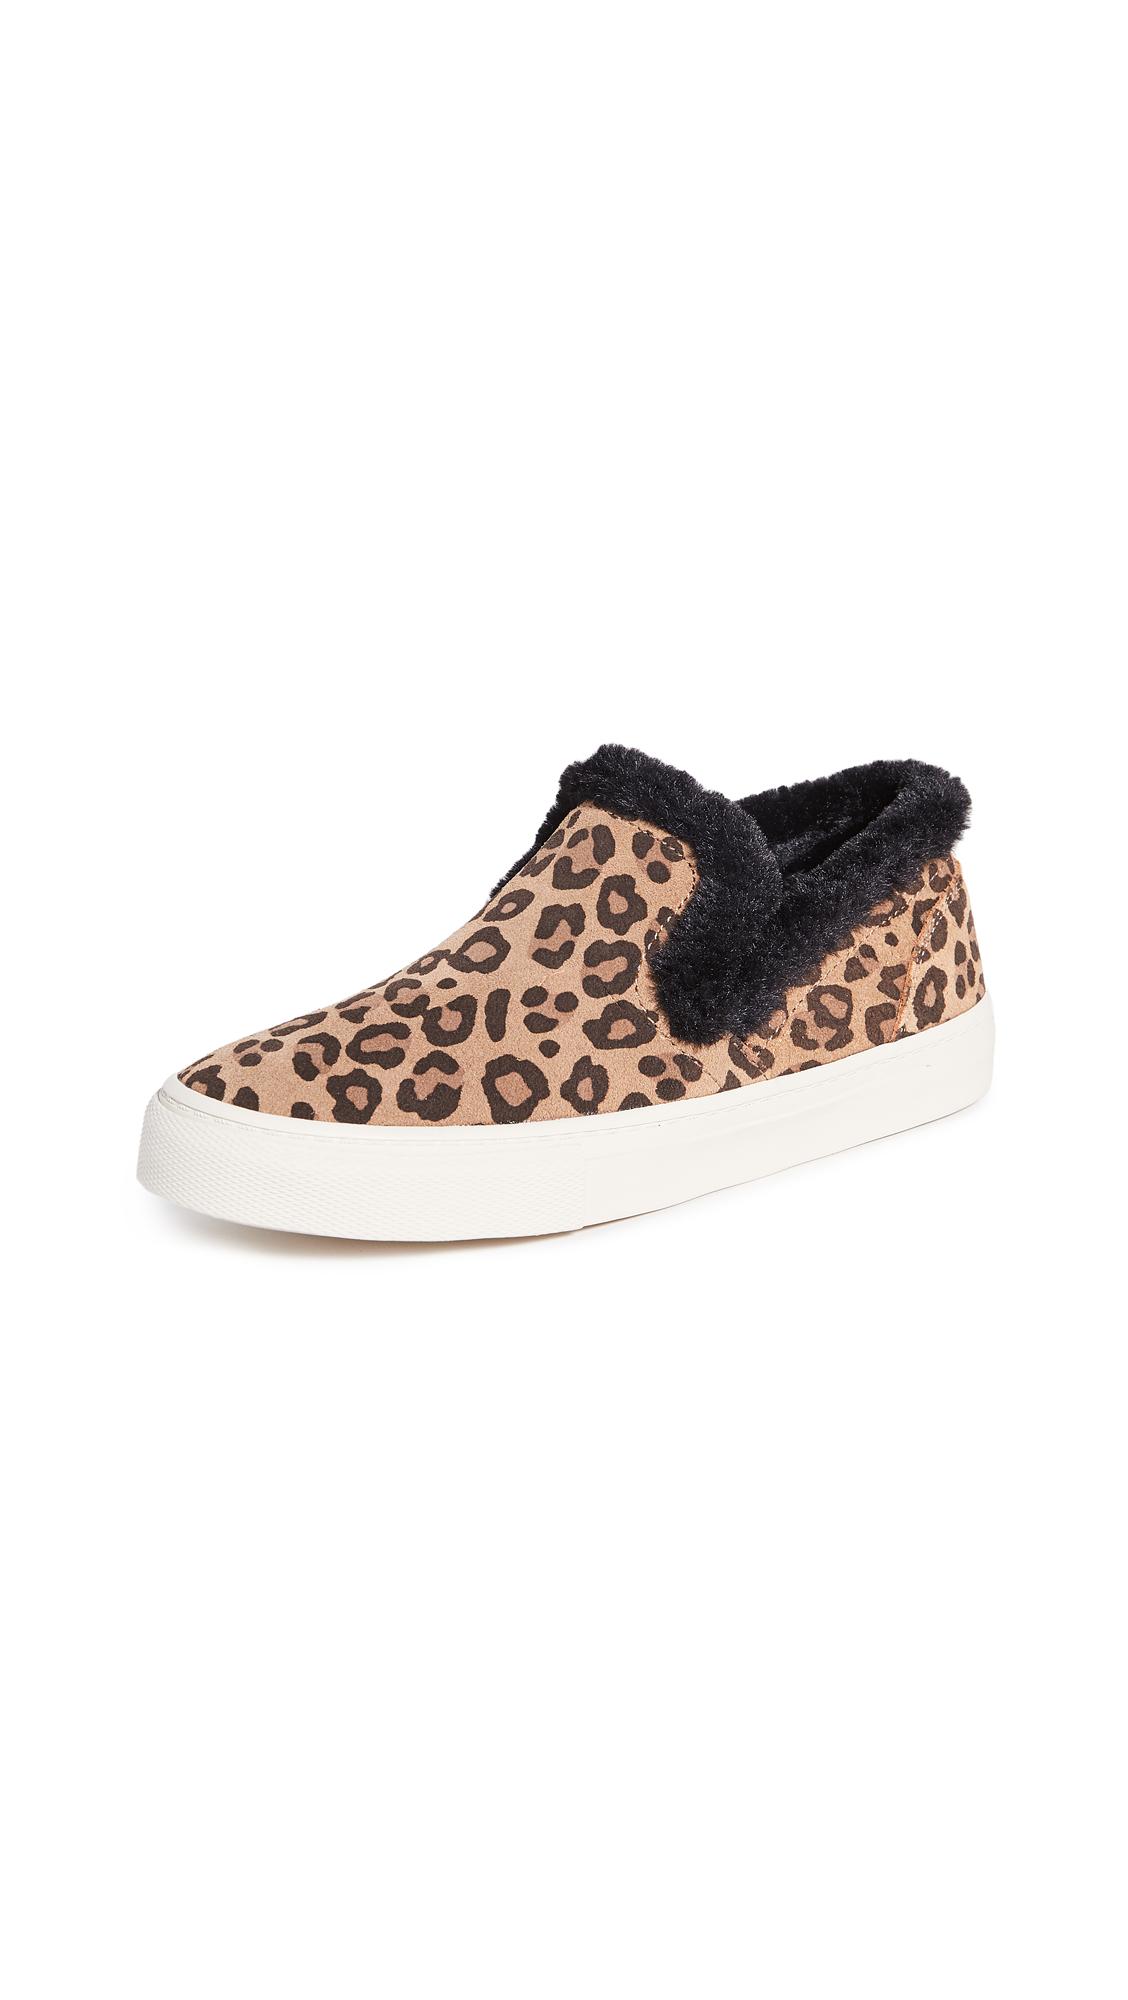 Tretorn Millie 2 Sneakers - 60% Off Sale